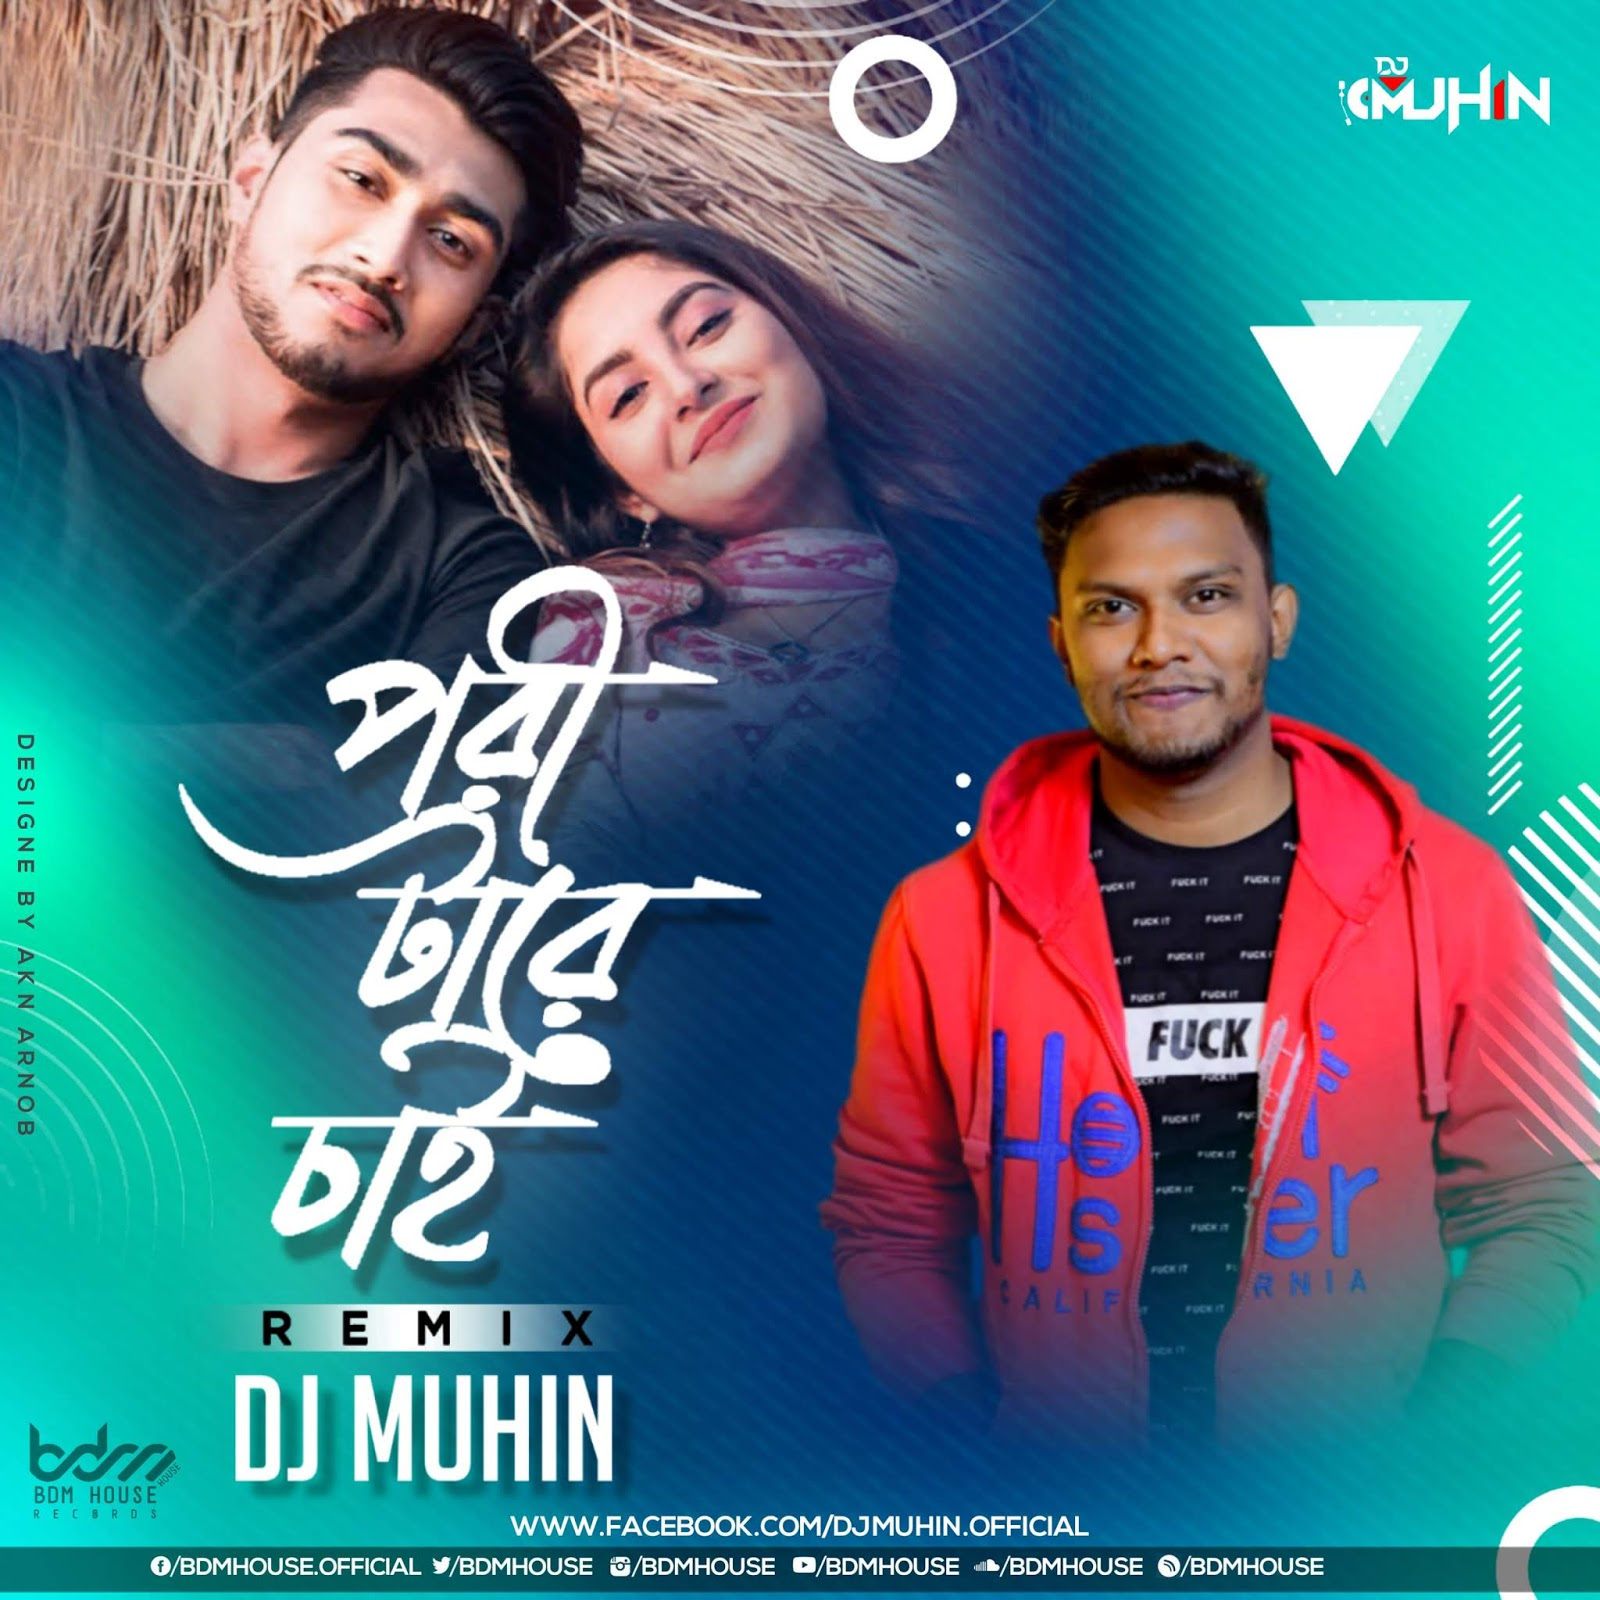 PORI TA RE CHAI (REMIX) - DJ MUHIN BY BDM HOUSE RECORDS